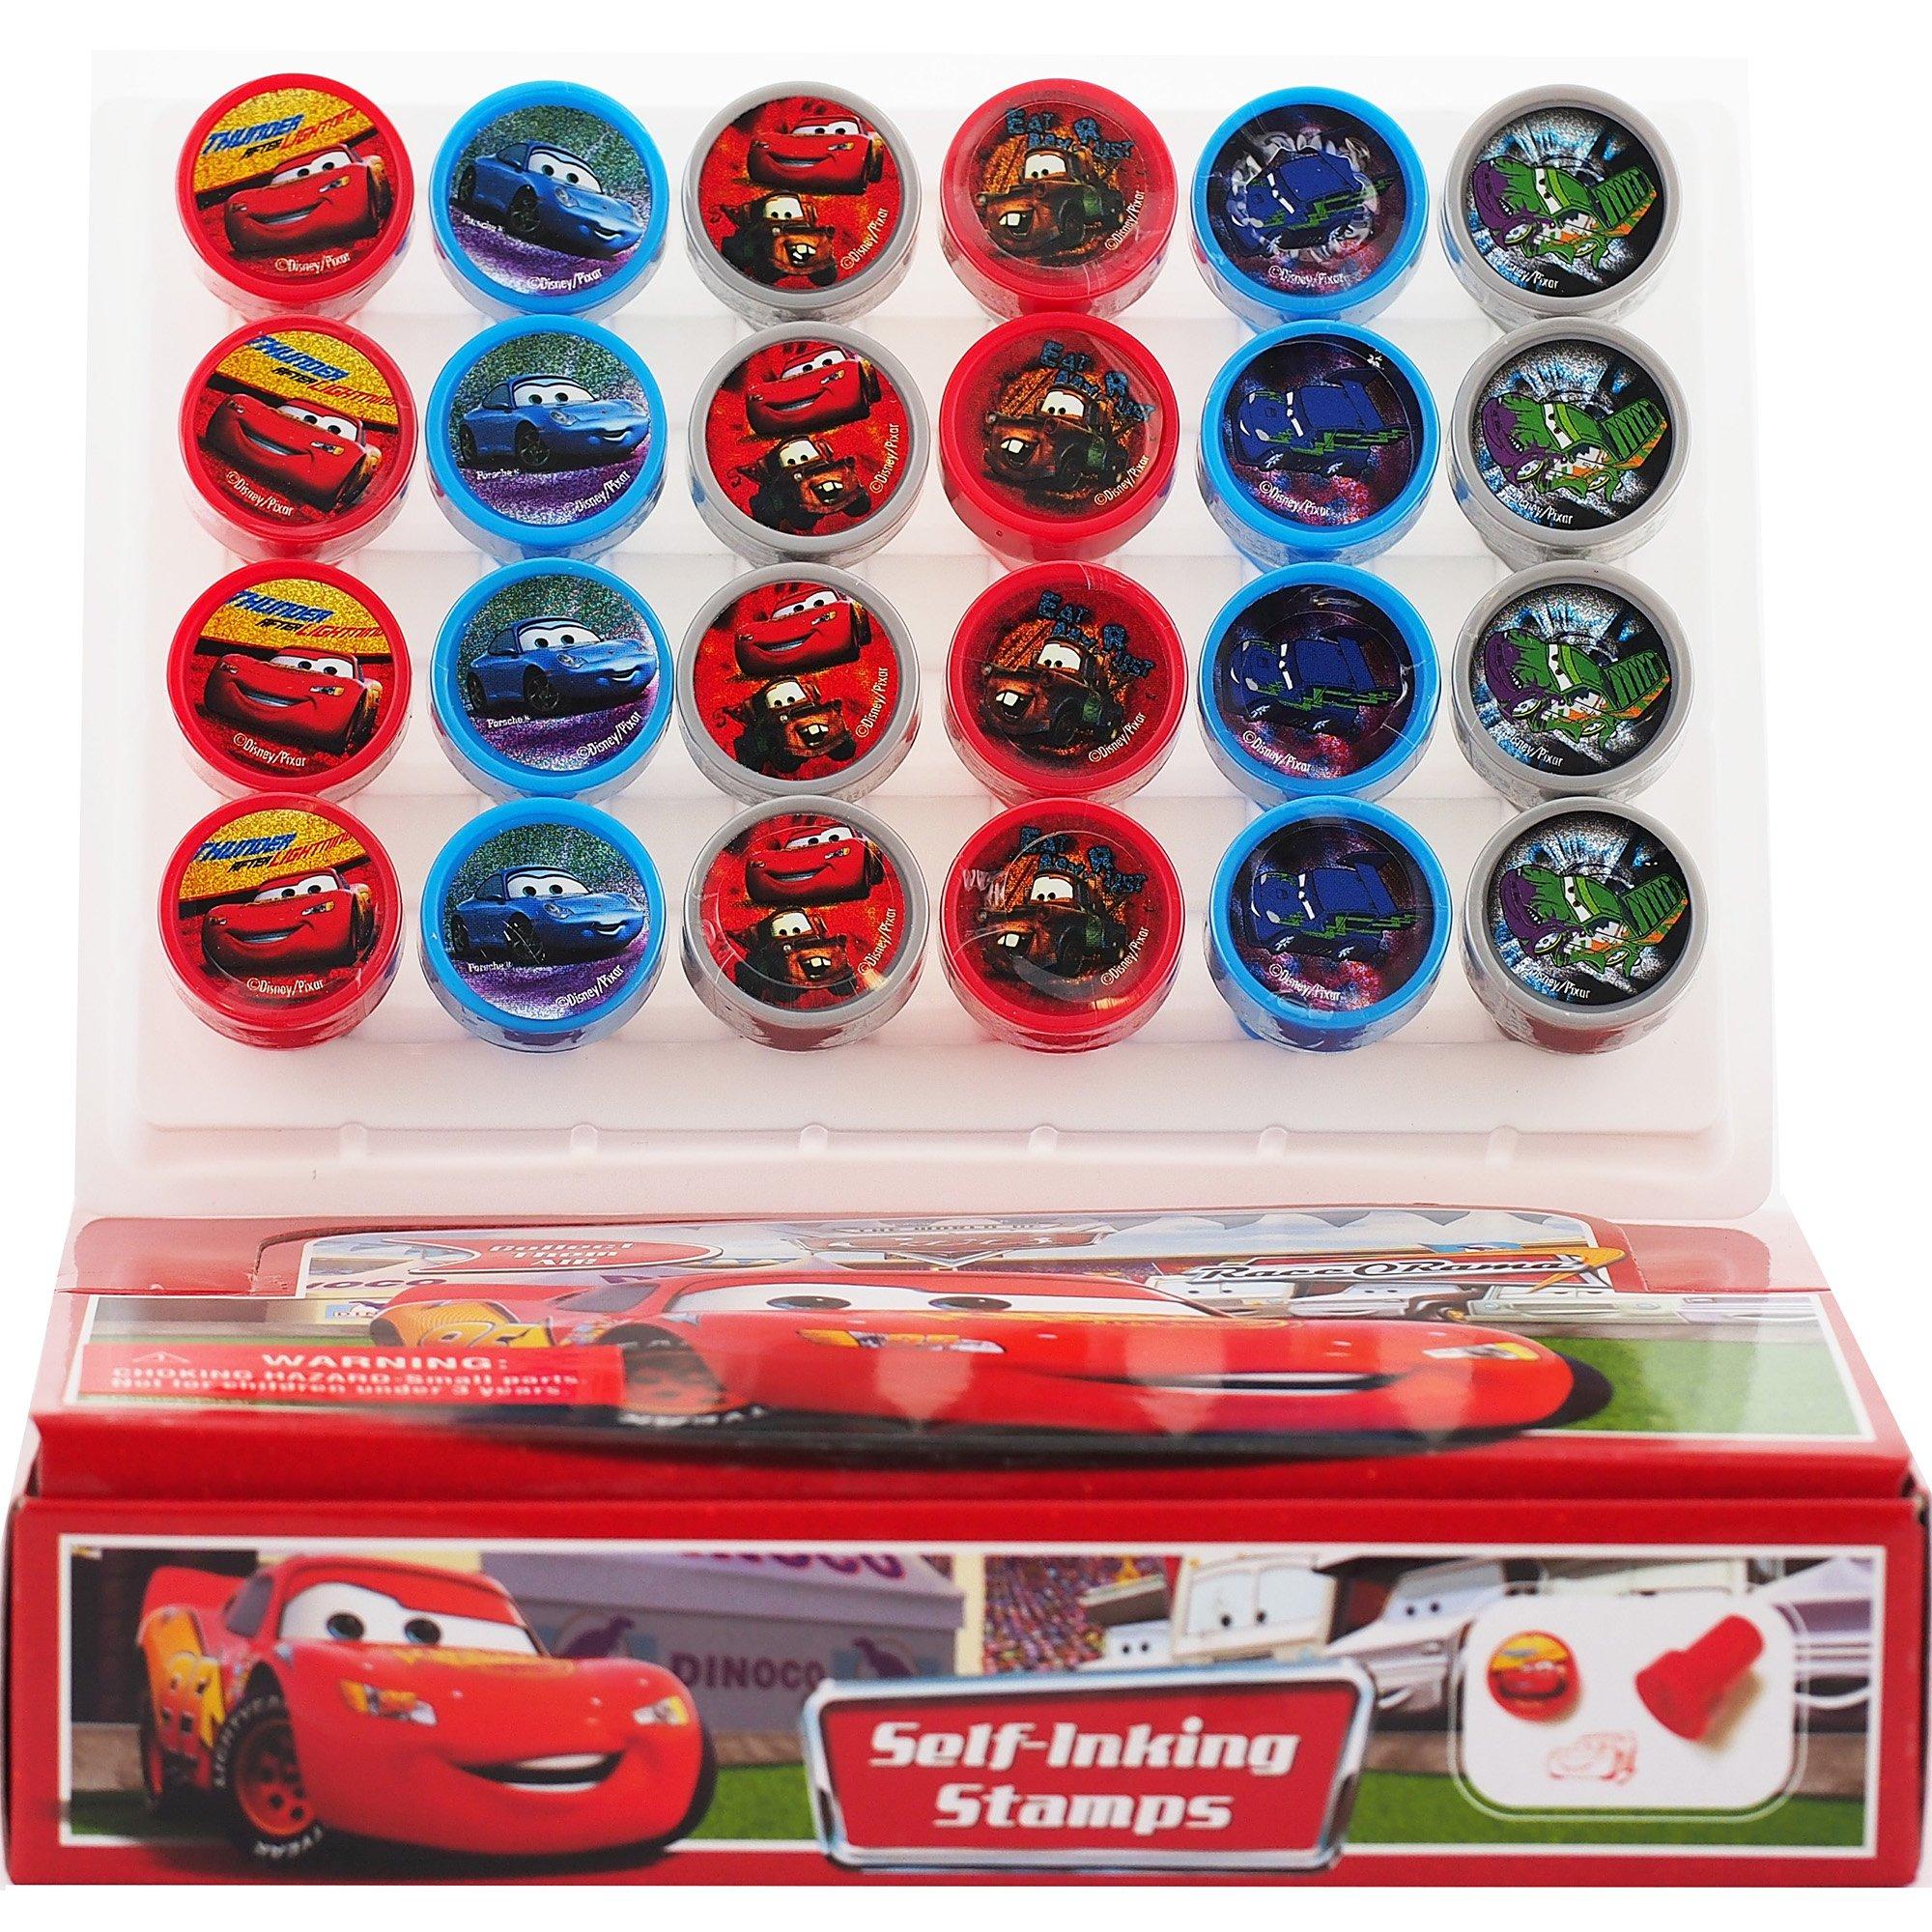 Disney Pixar Movie CARS Stampers Box: Stamp Art Set (24 pcs)